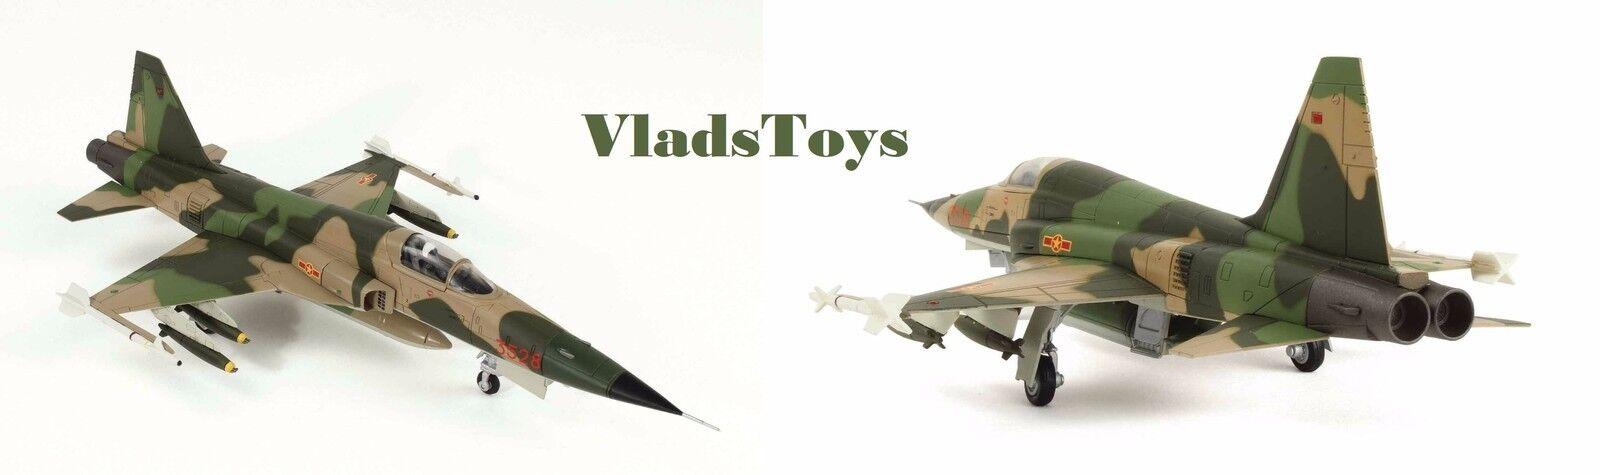 Hobby Master 1:72 1:72 1:72 F-5E Tiger II Vpaf 935th Rosso 3528 Bien Hao Ab Vietnam HA3327 24434a